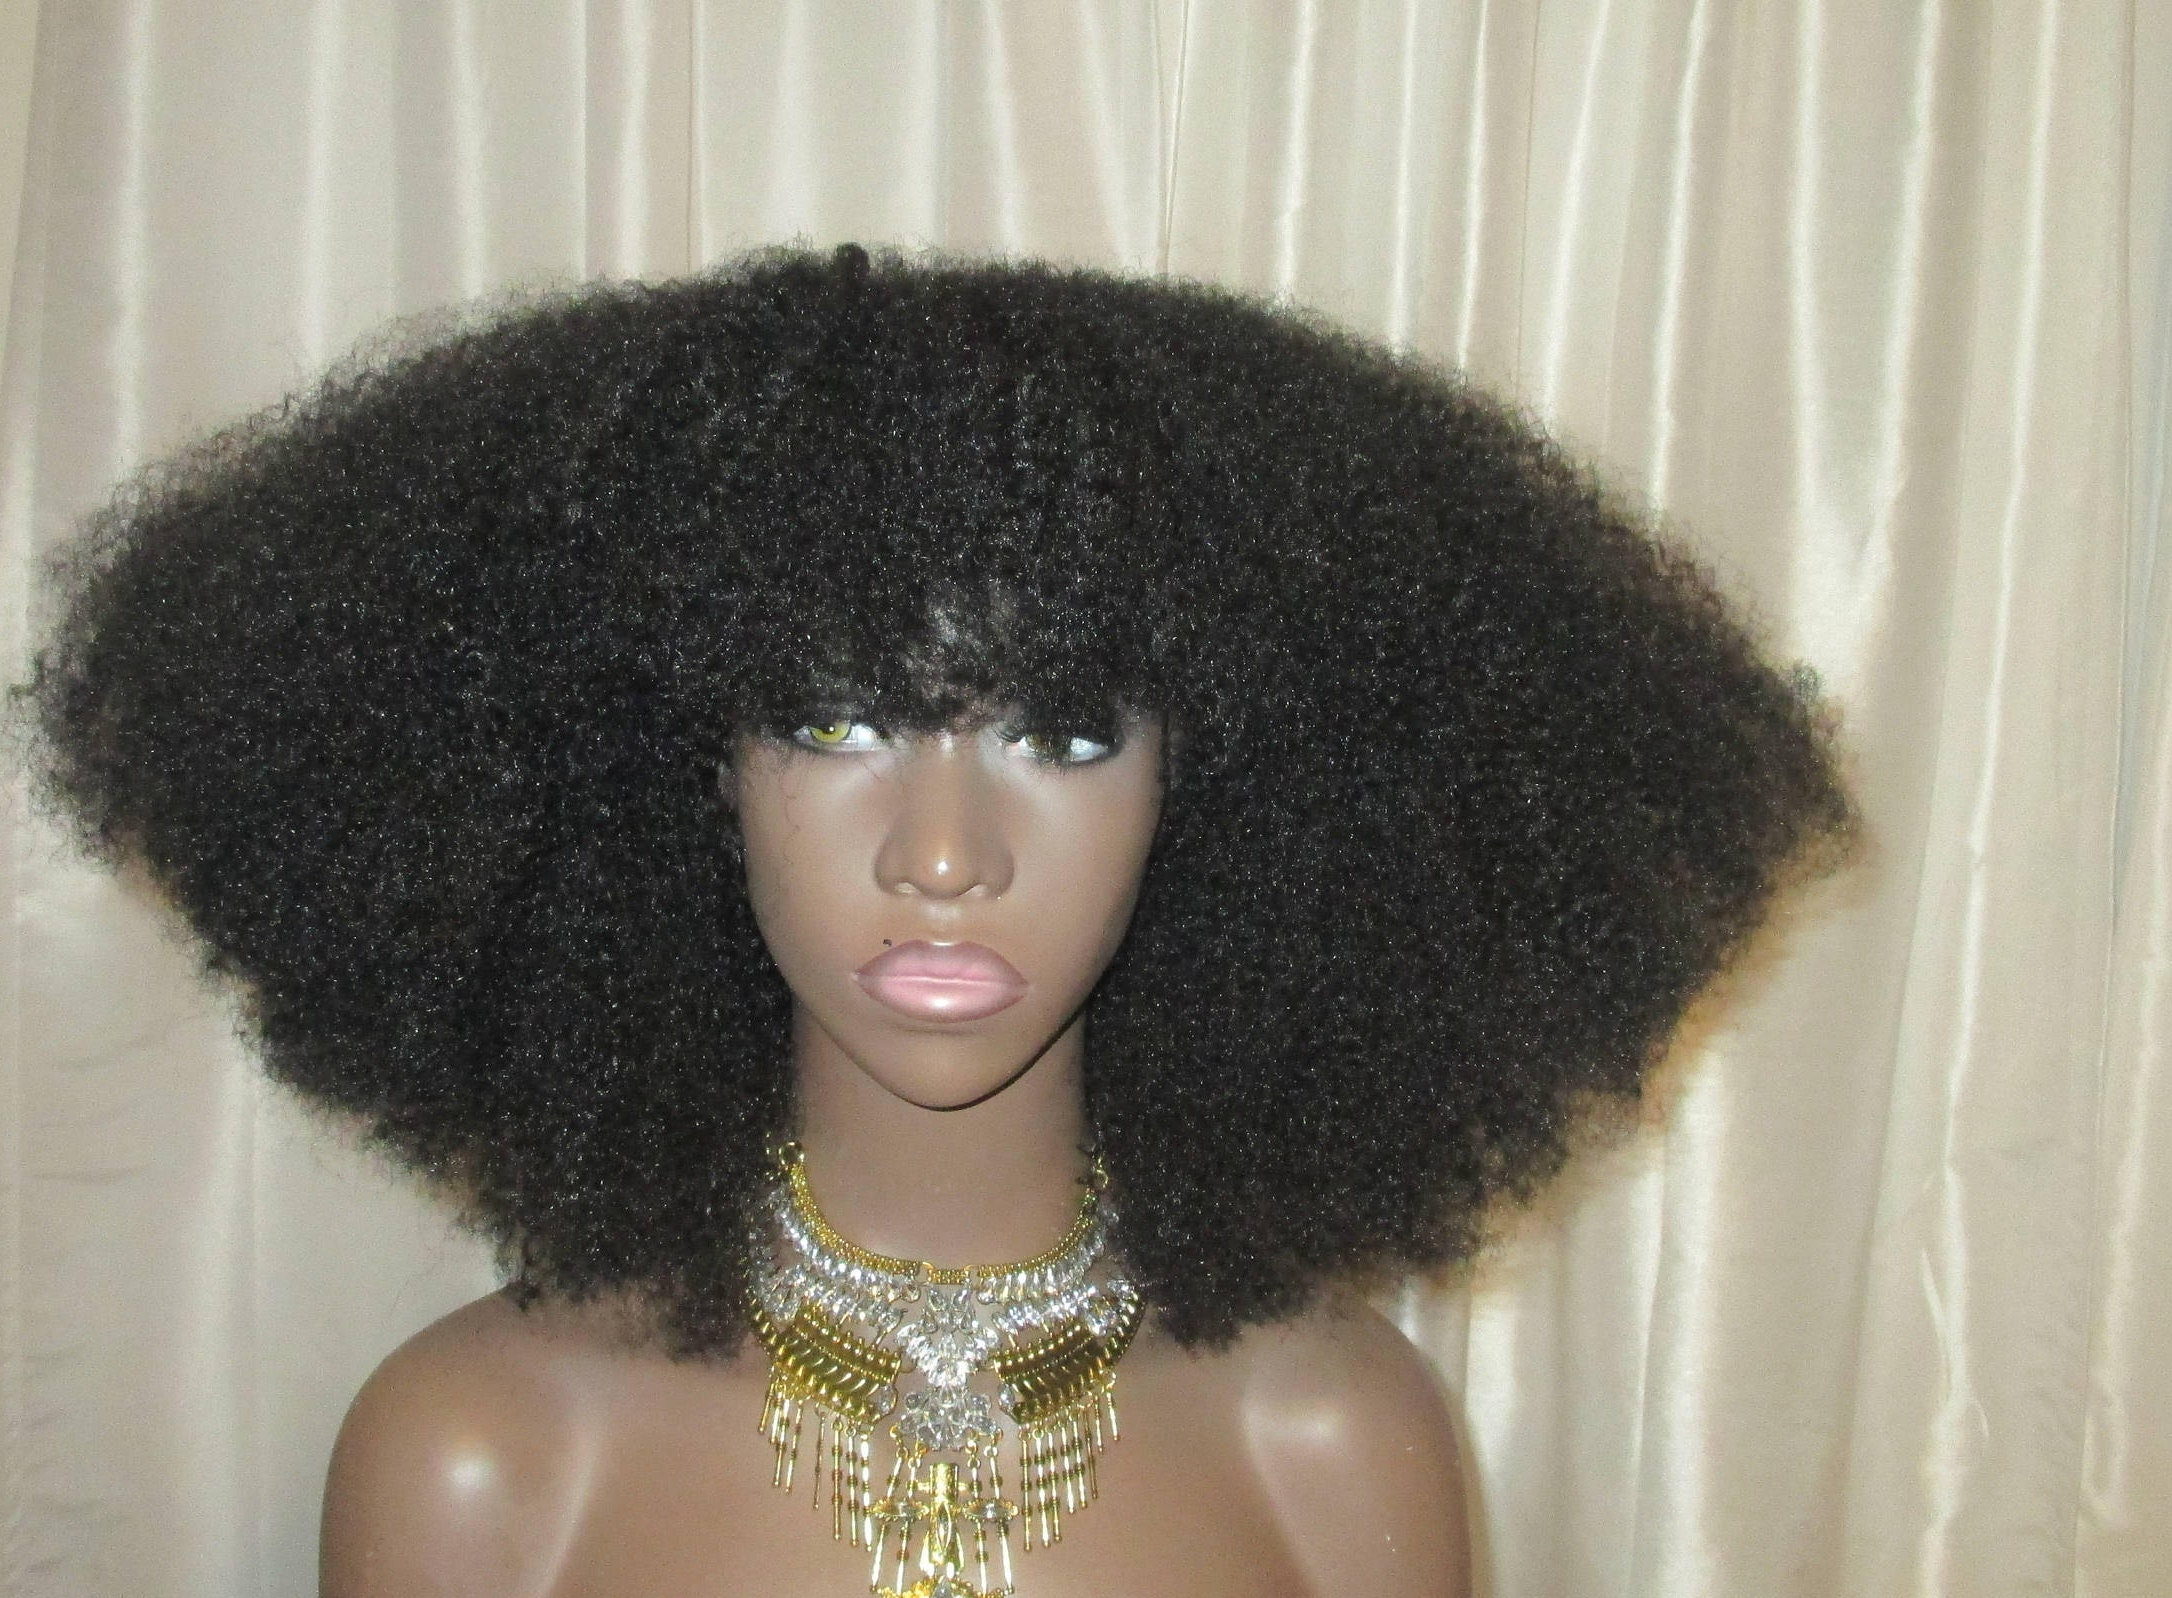 Essence Wigs Gorgeous 4c Bangs Afro Kink Bohemian Vibe Fro